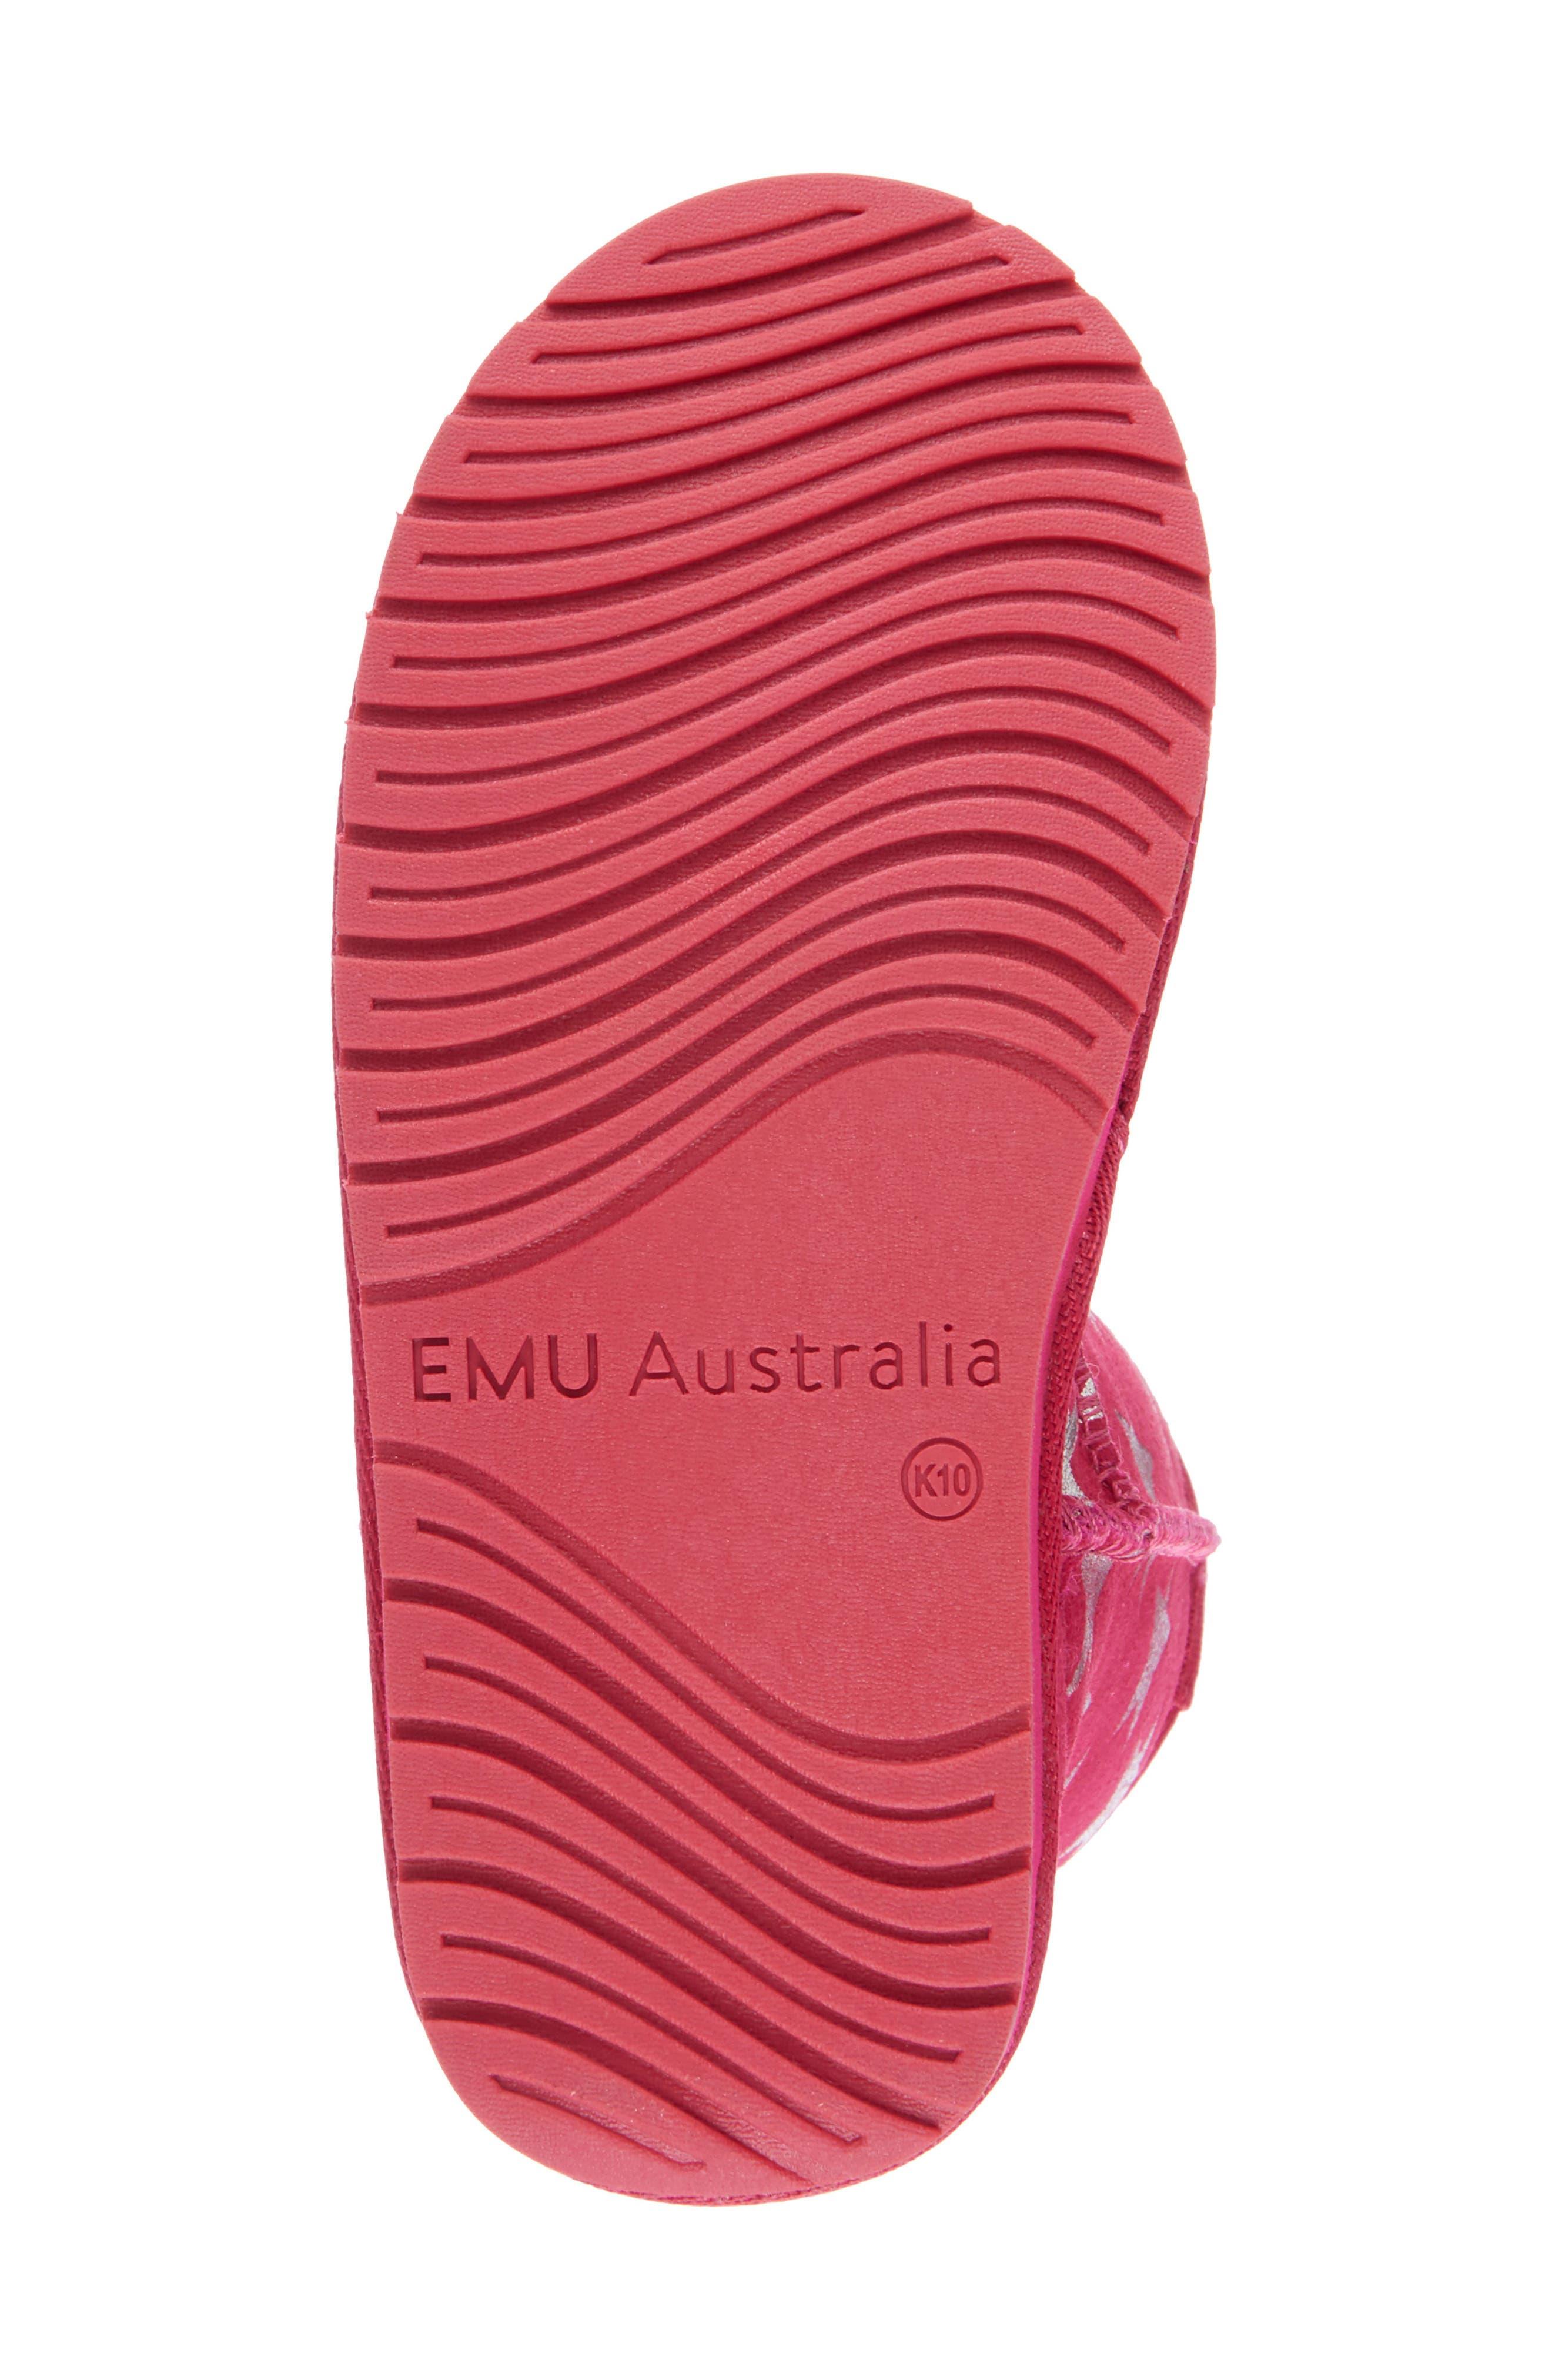 EMU AUSTRALIA,                             EMUAustralia Starry Night Boot,                             Alternate thumbnail 6, color,                             665